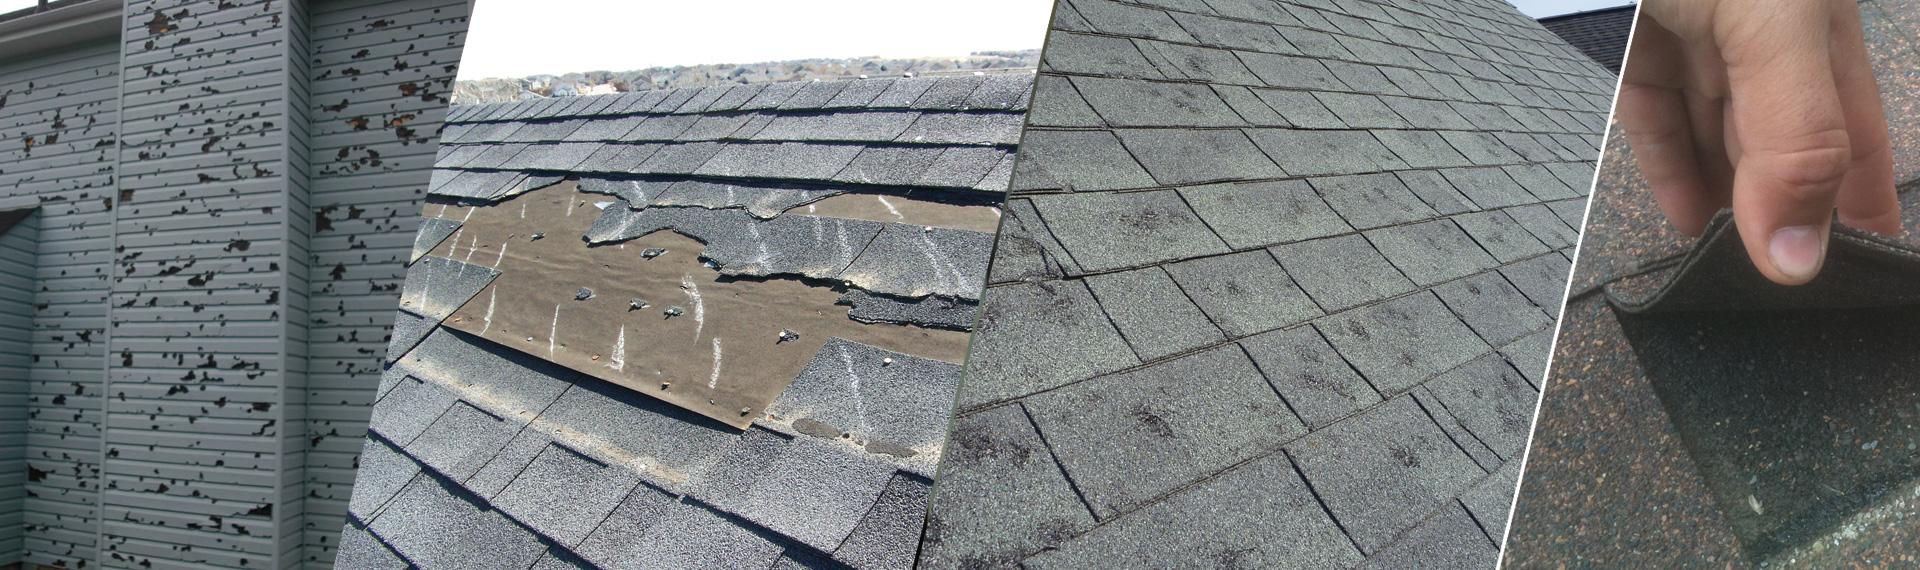 Denver Roofing & Construction Littleton CO